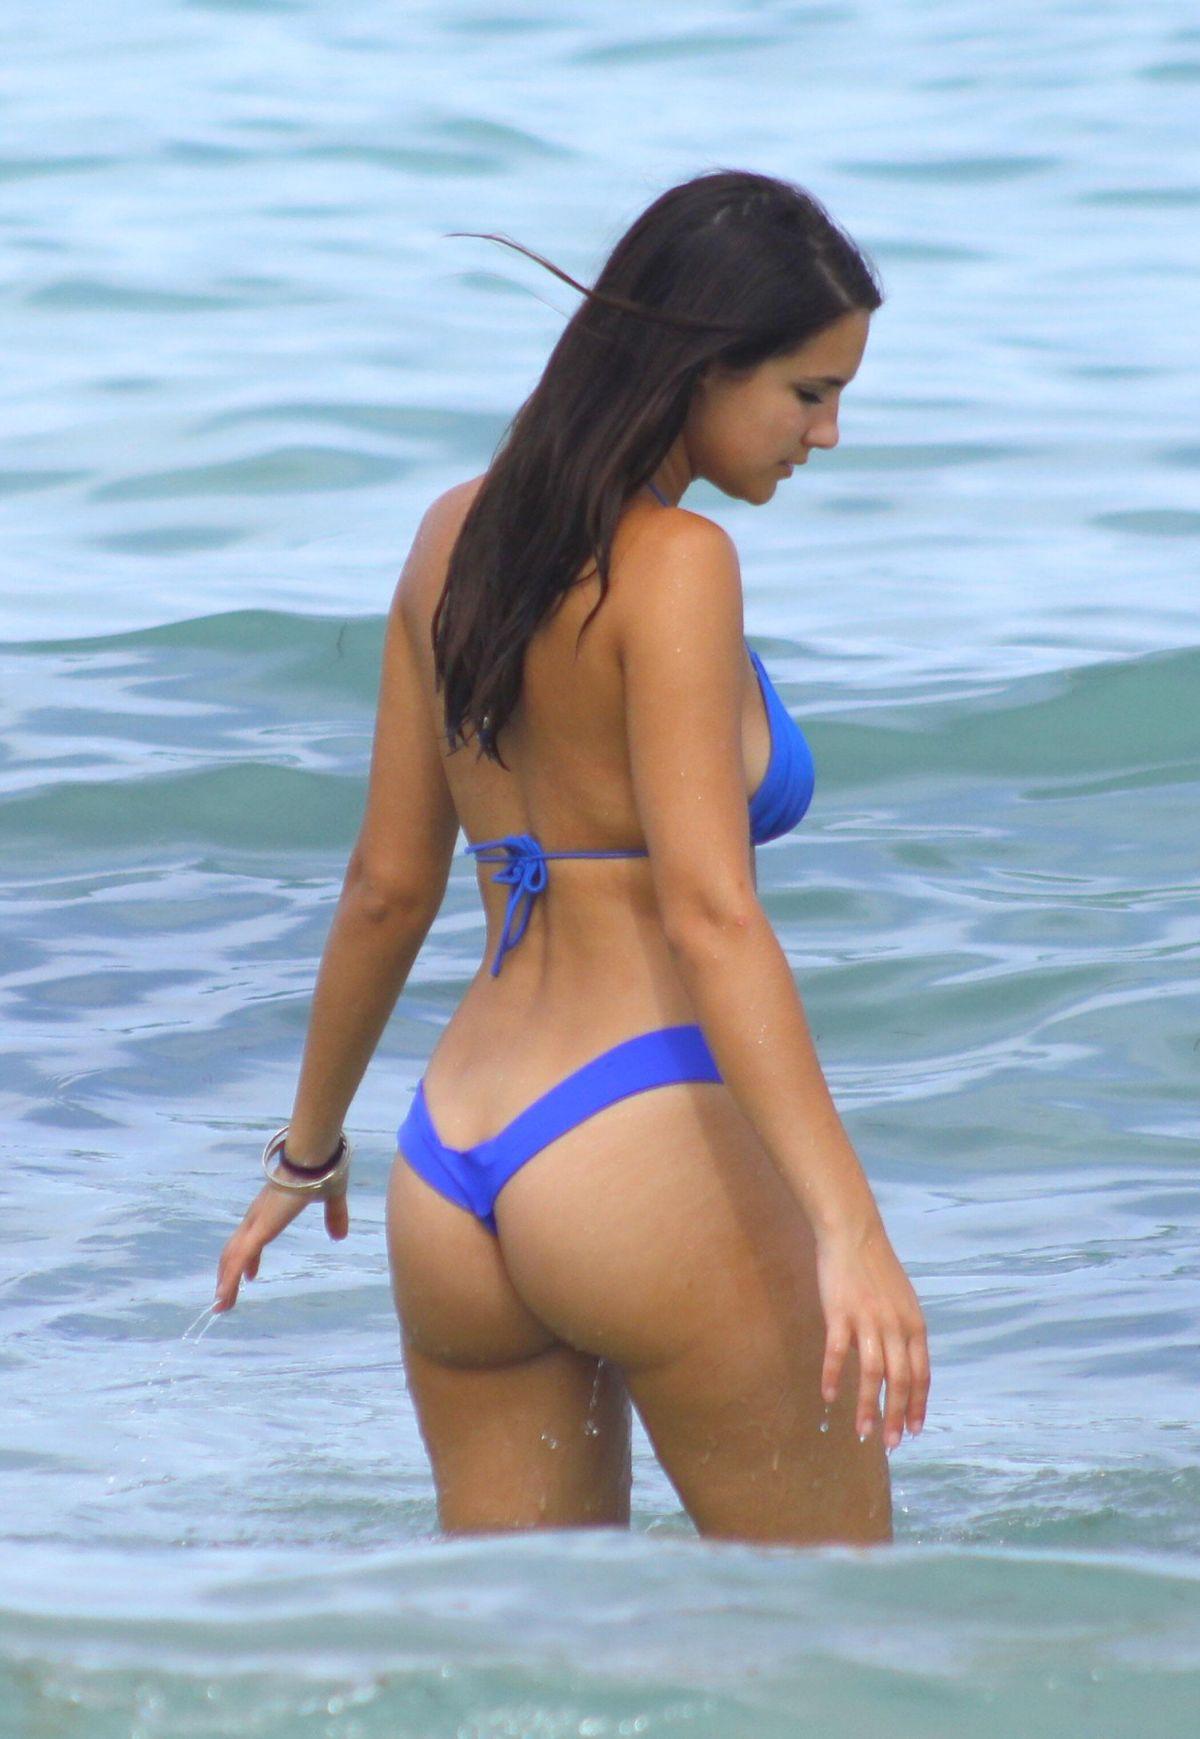 Tao Wickrath in a White Bikini on Miami Beach 2 Pic 4 of 35